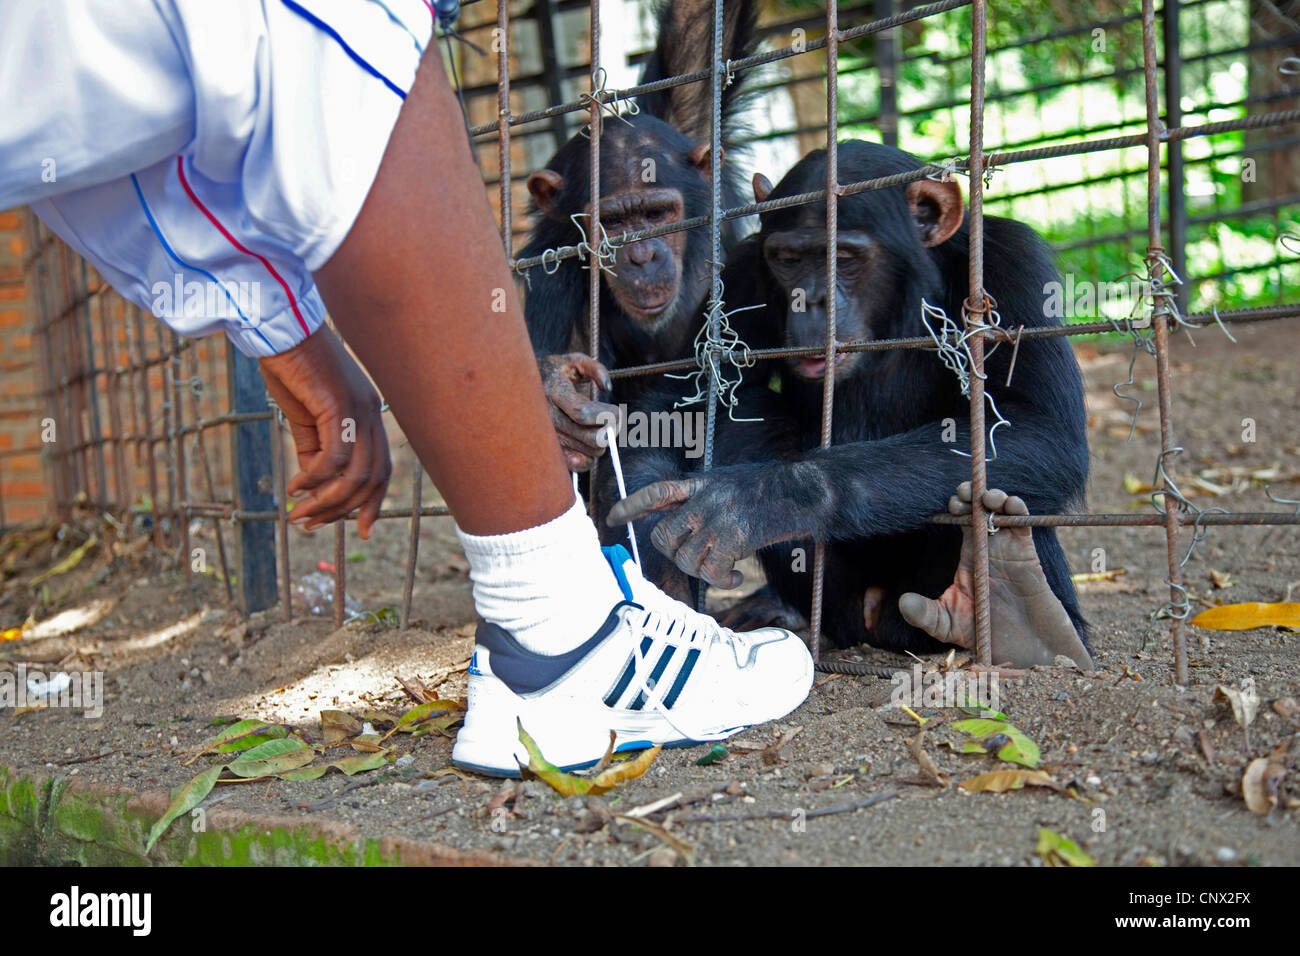 common chimpanzee (Pan troglodytes), two monkey trying to tie one man's shoes, Burundi, Bujumbura Mairie, Bujumbura - Stock Image